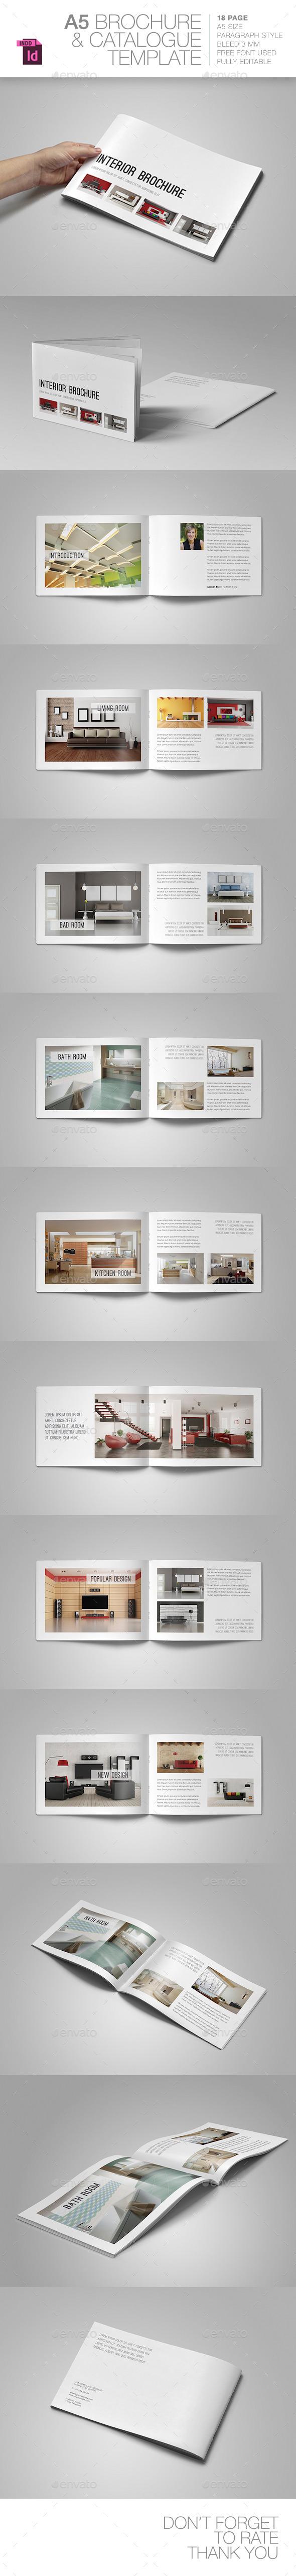 GraphicRiver A5 Brochure Template 9466122